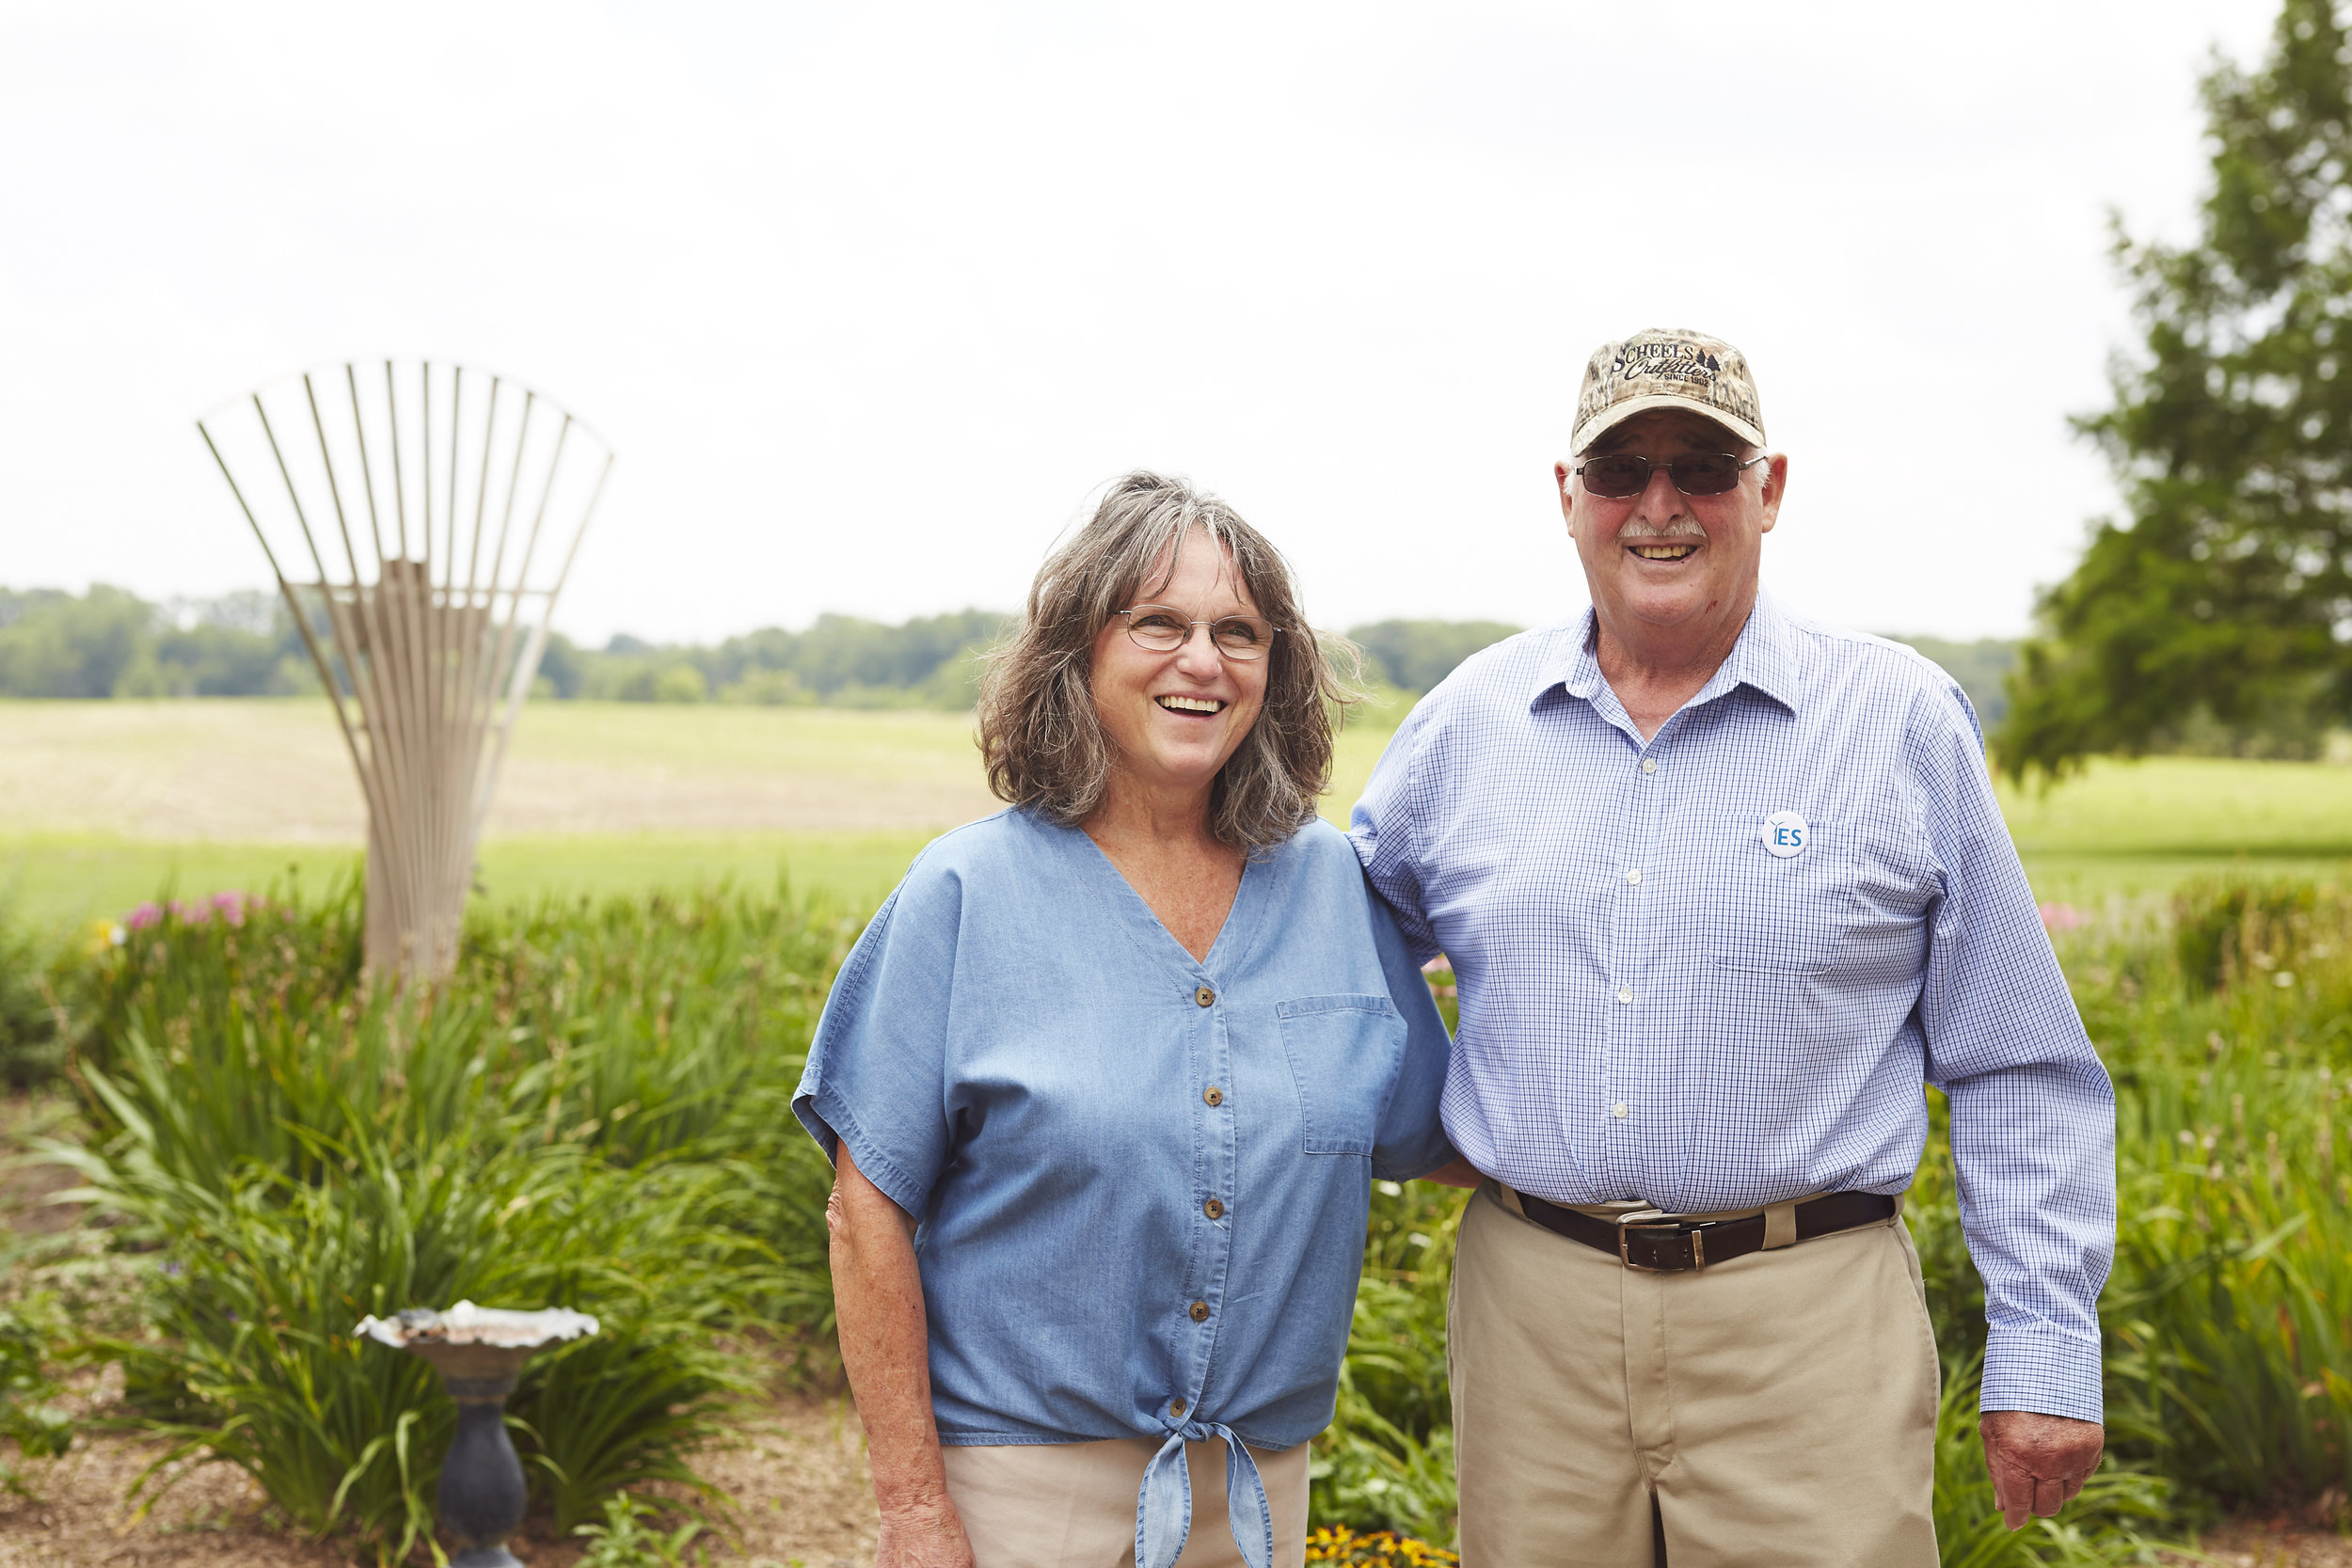 Portrait of Professionals on Farm